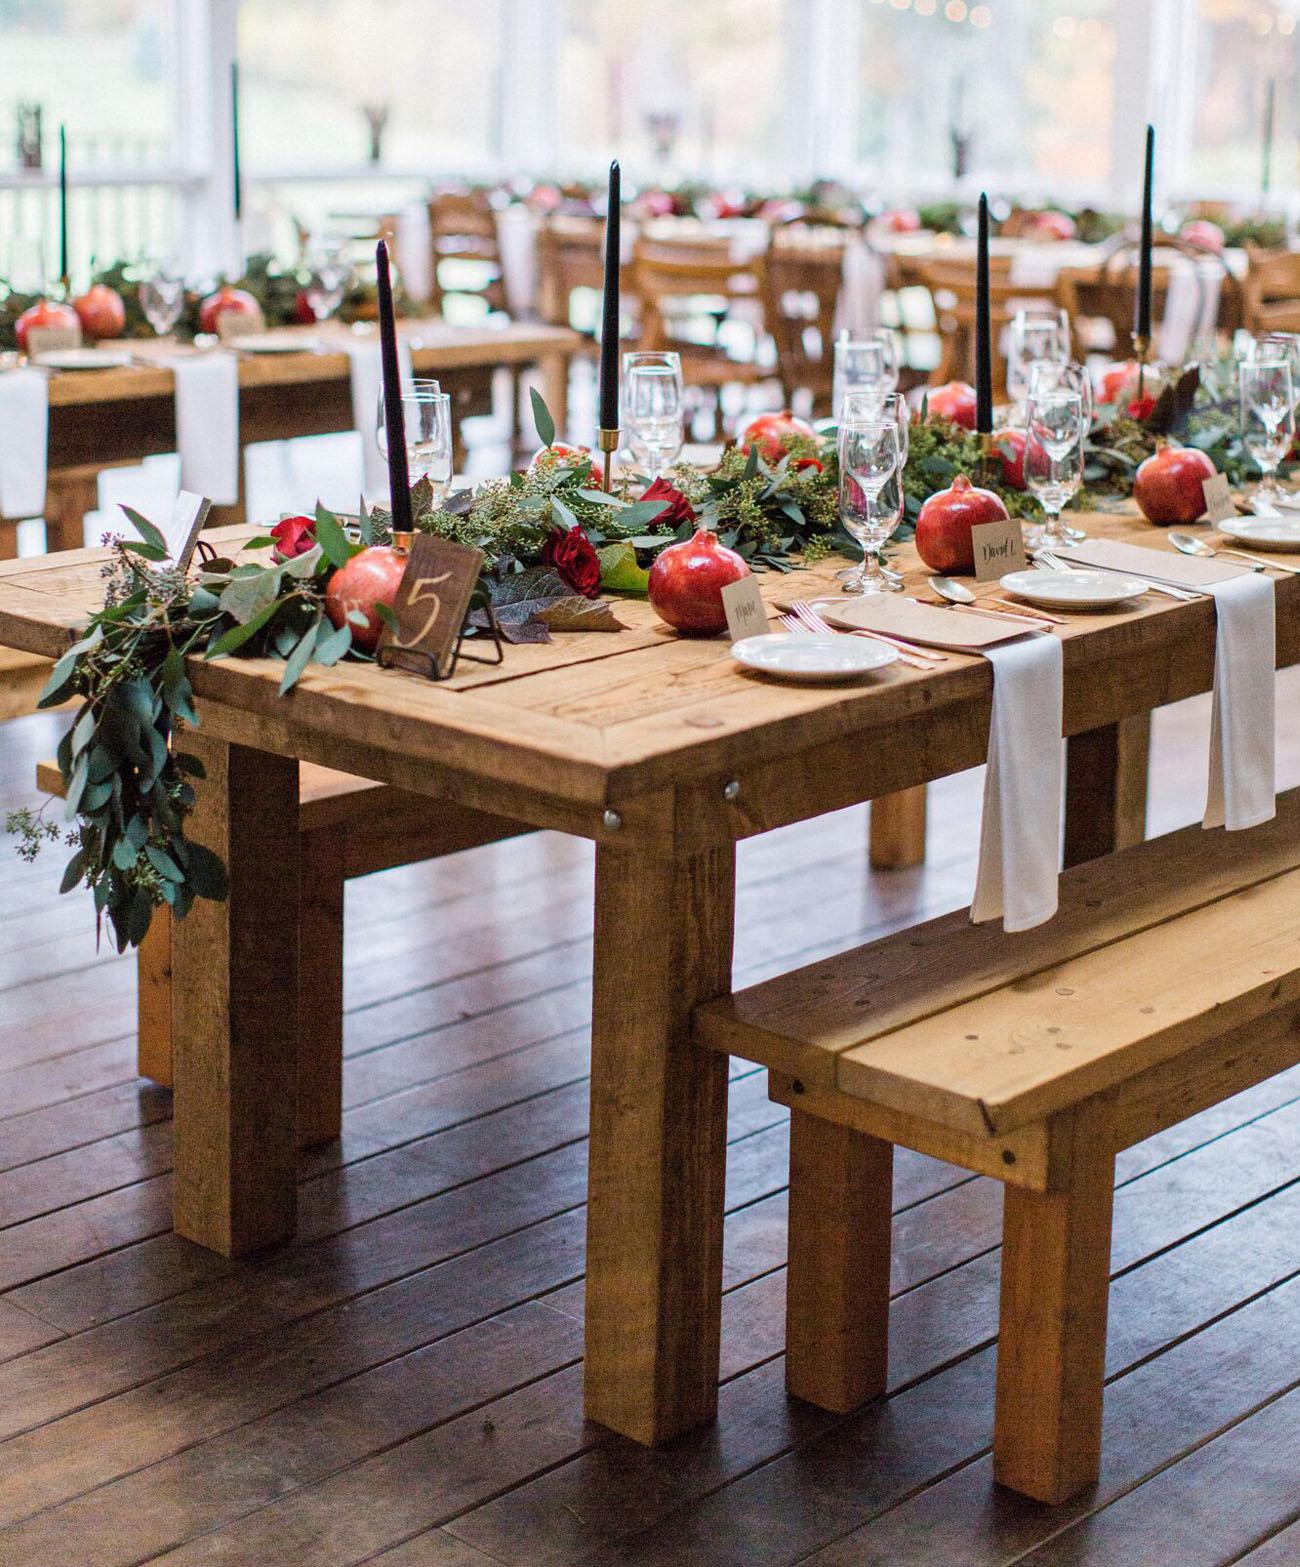 pomegranate table favors